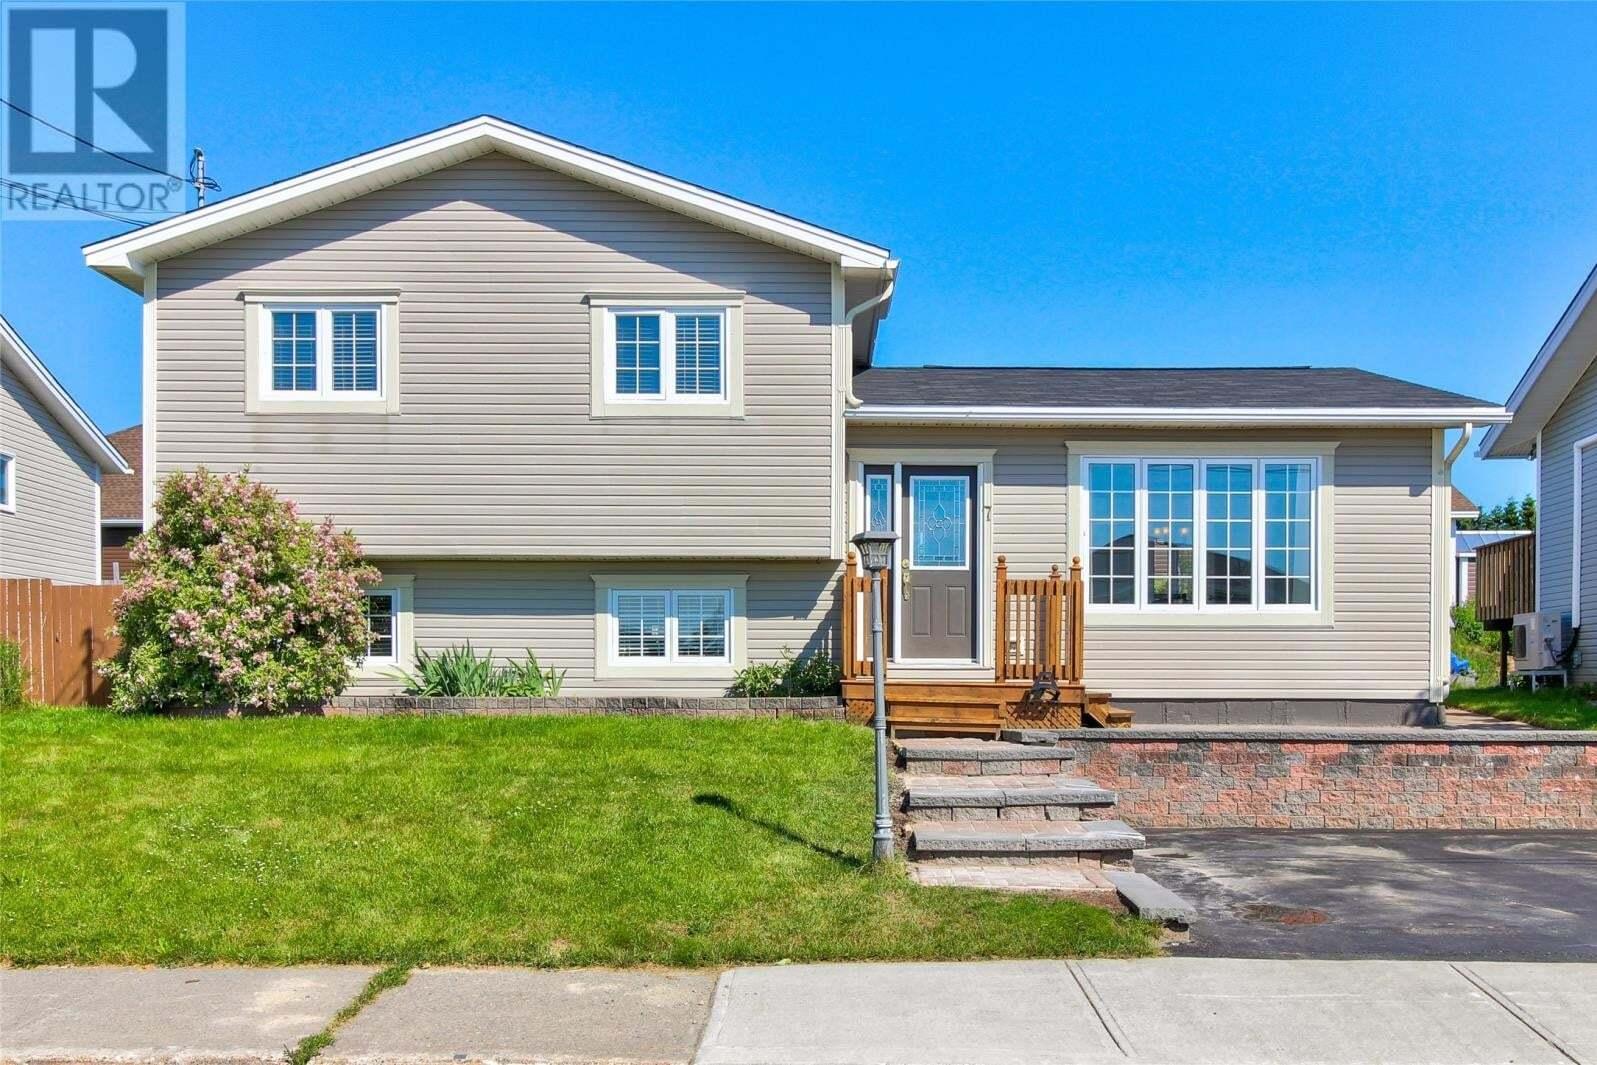 House for sale at 7 Denford Estates Conception Bay South Newfoundland - MLS: 1217878